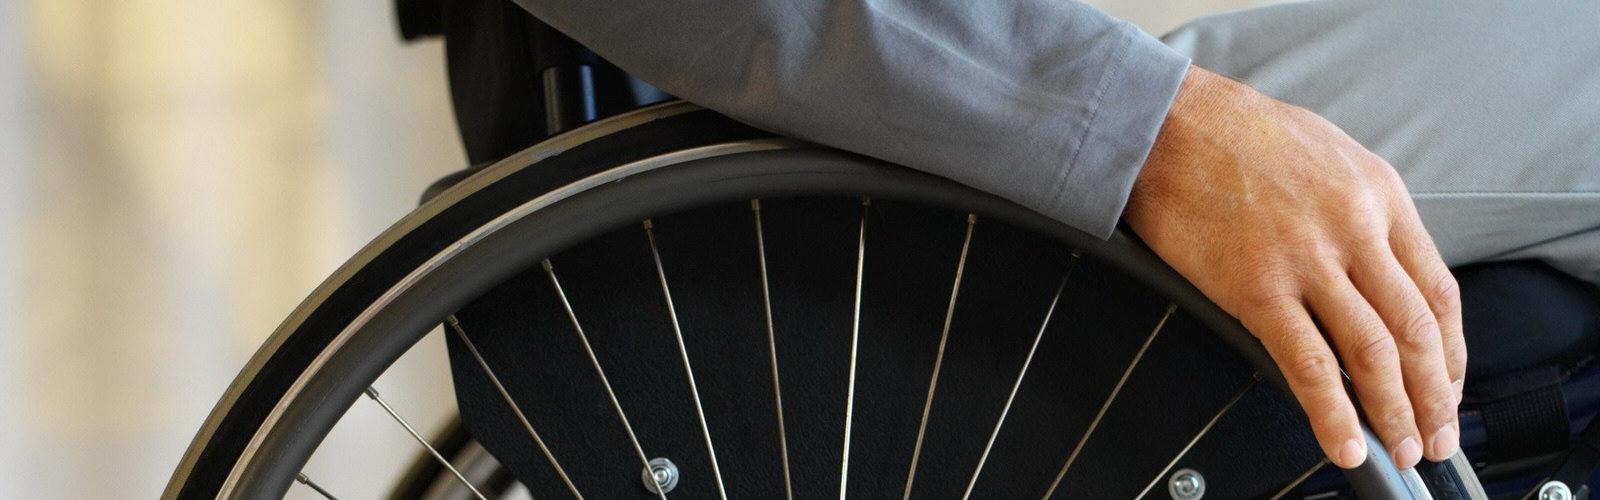 Man utilising his wheelchair